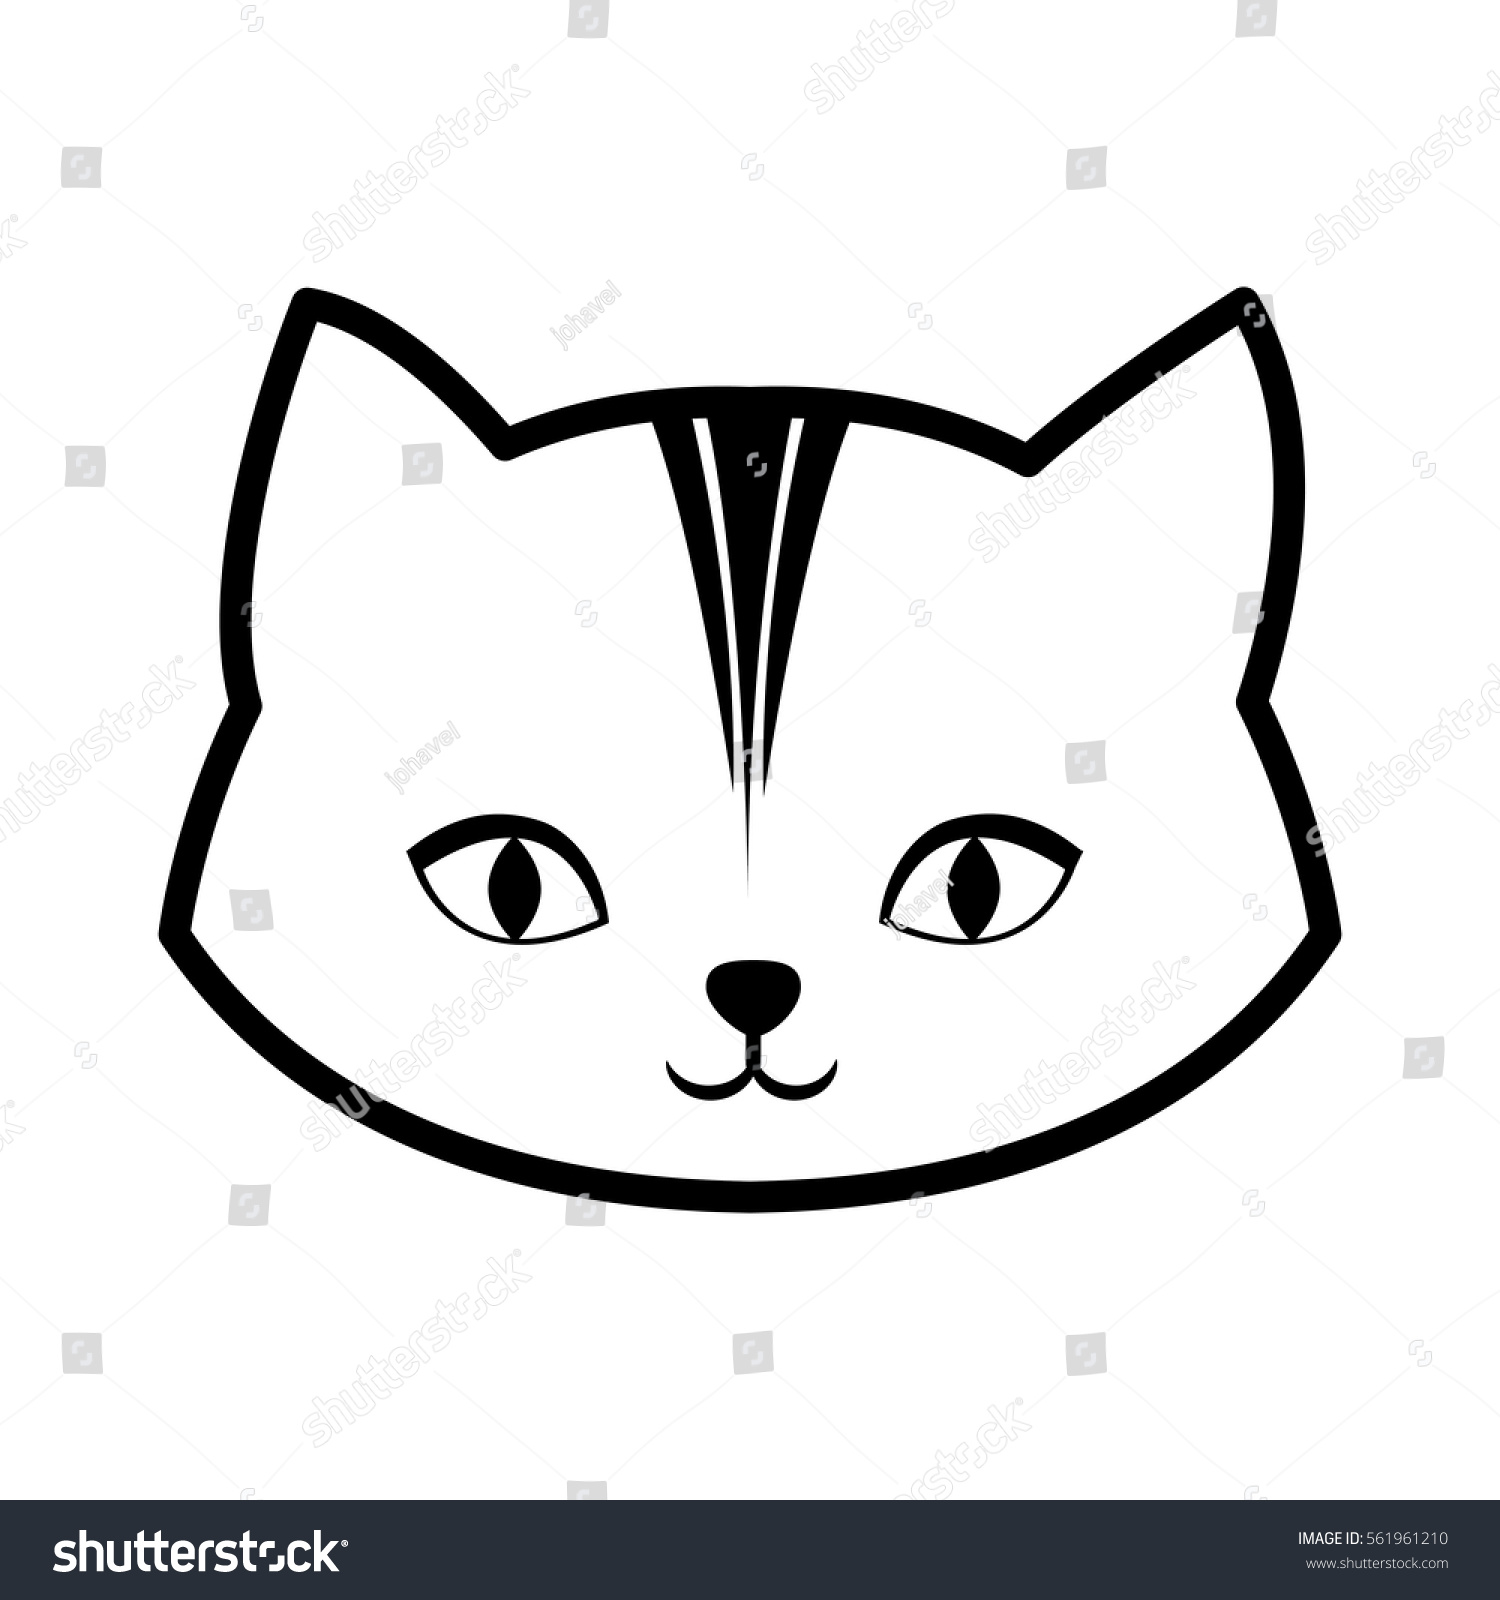 face cat feline curious small outline stock vector 561961210